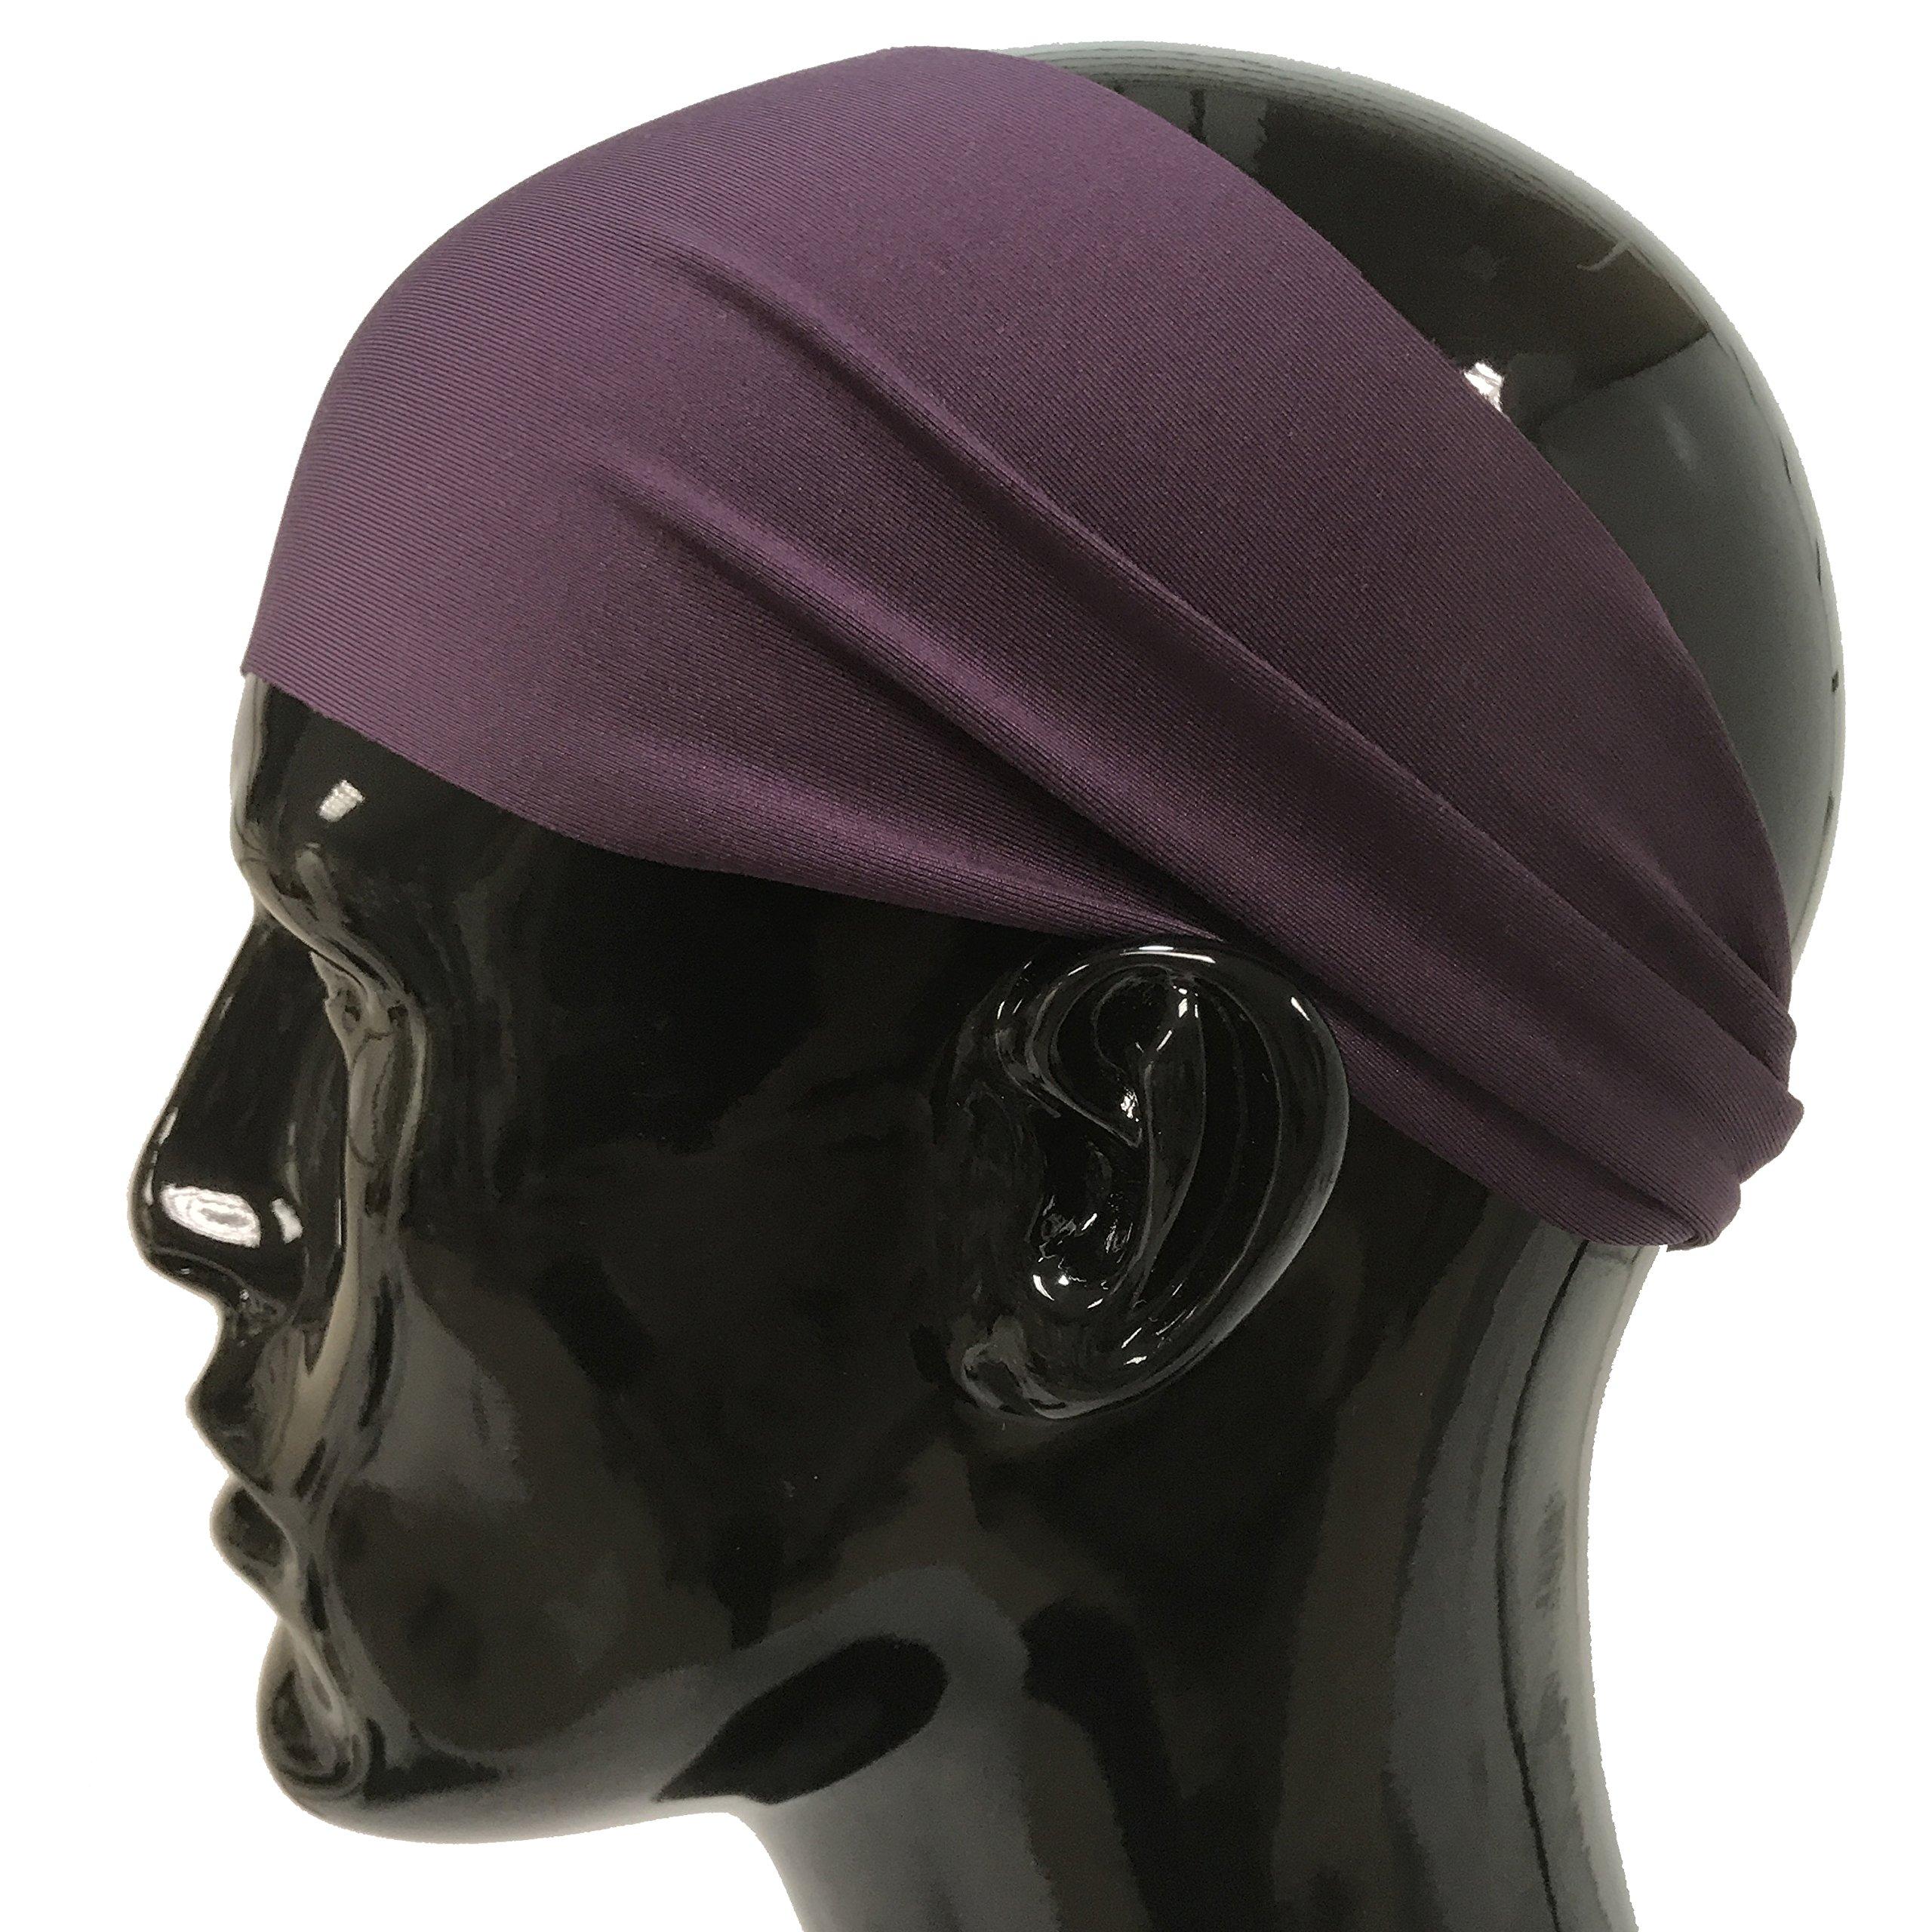 Temple Tape Headbands for Men